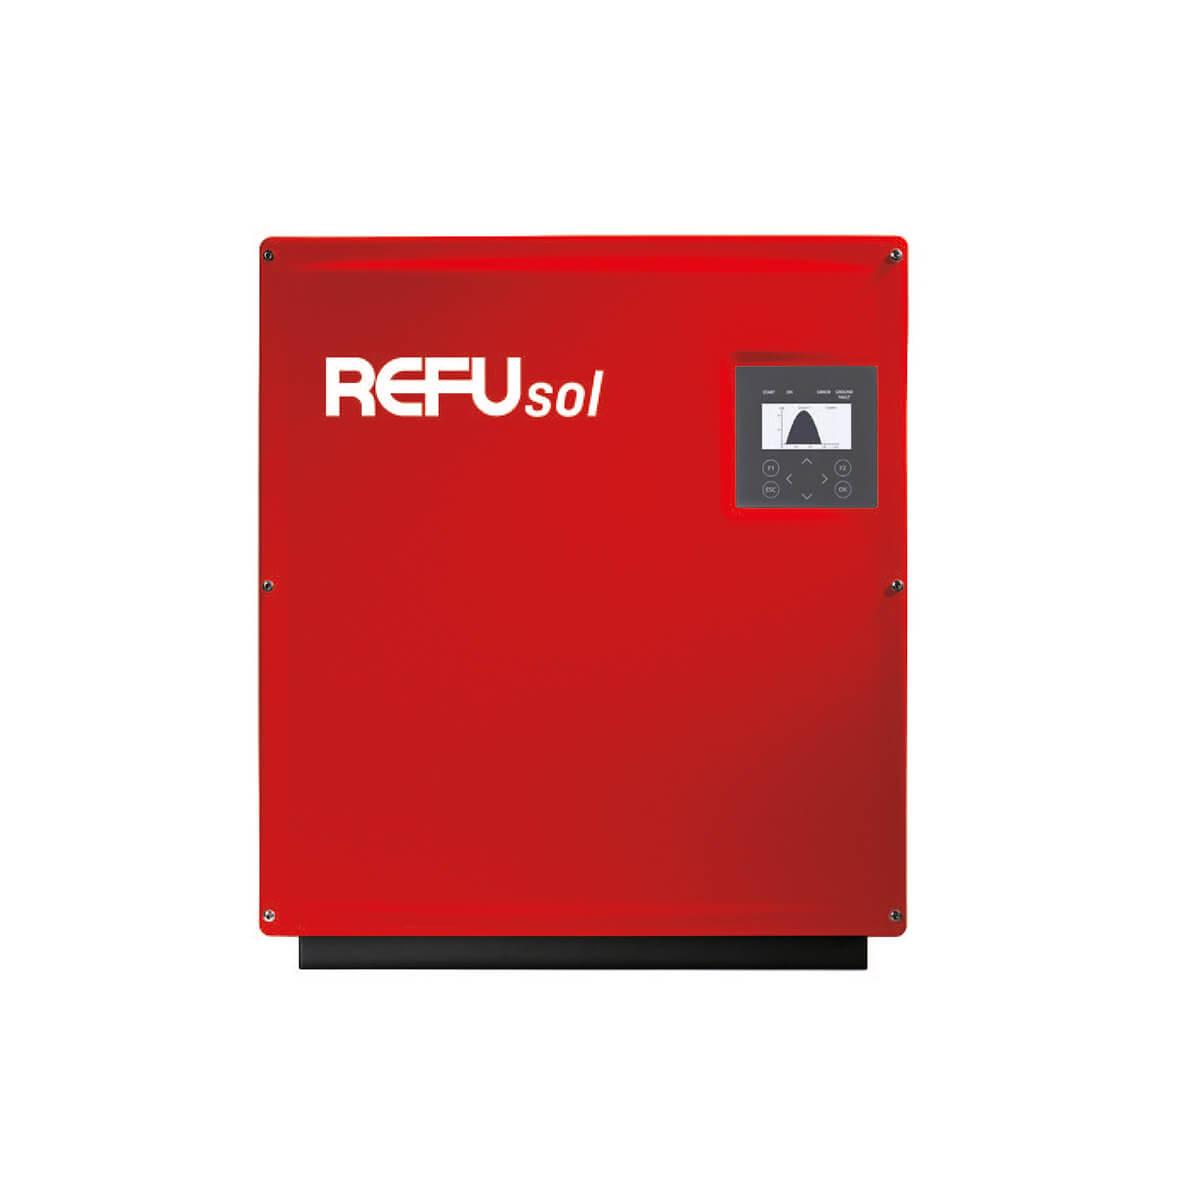 refusol 10kW inverter, refusol 10k 10kW inverter, refusol 10k inverter, refusol 10k, refusol 10 kW, REFUSOL 10 KW